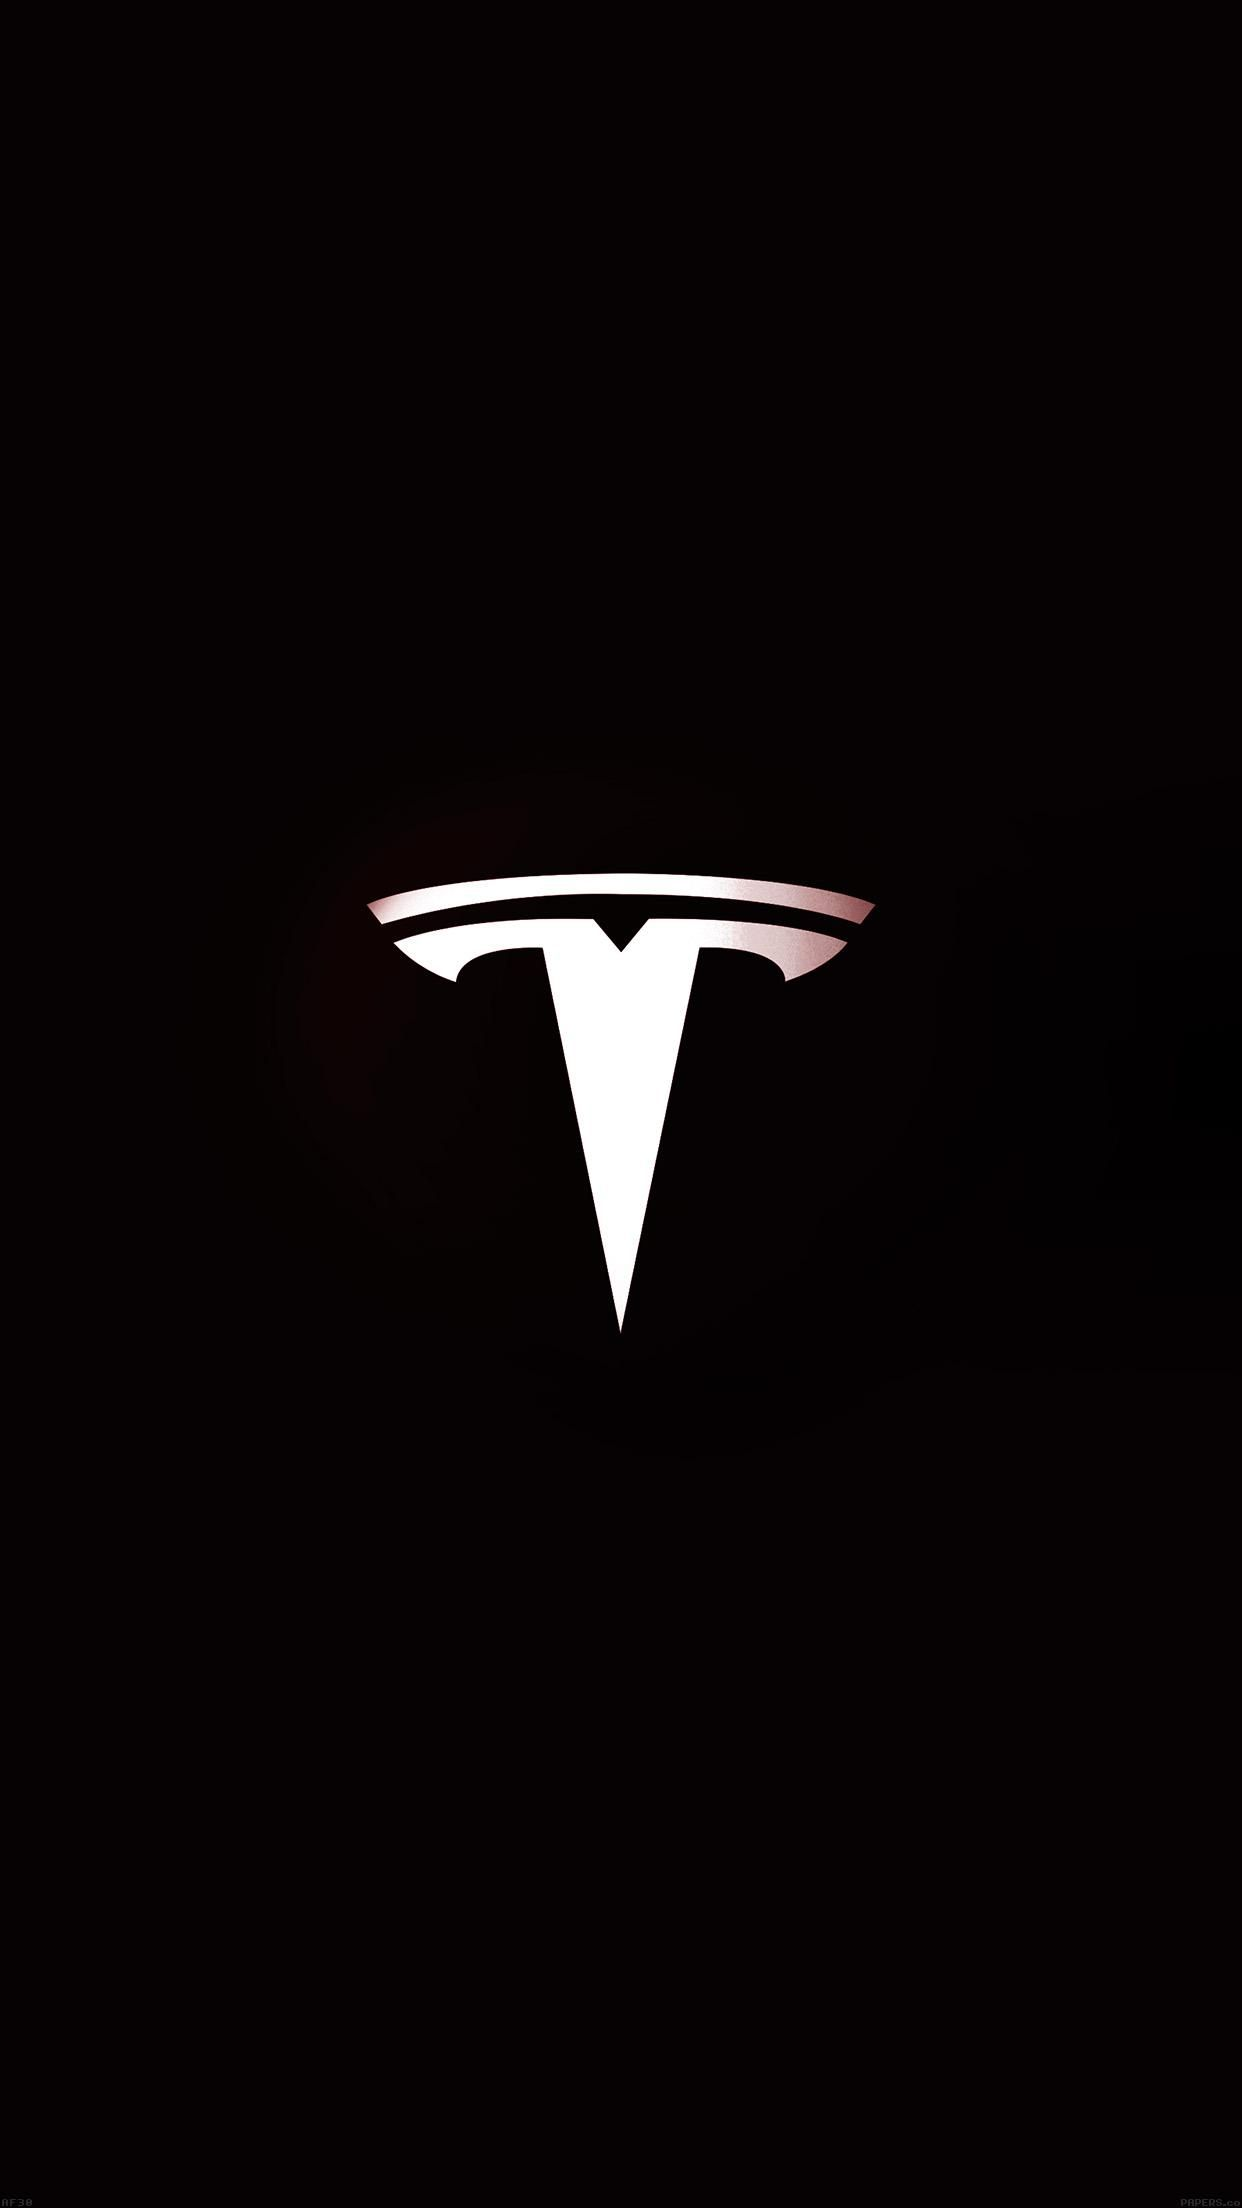 30 units of Tesla Wallpaper Tesla roadster Tesla motors Motor logo 1242x2208